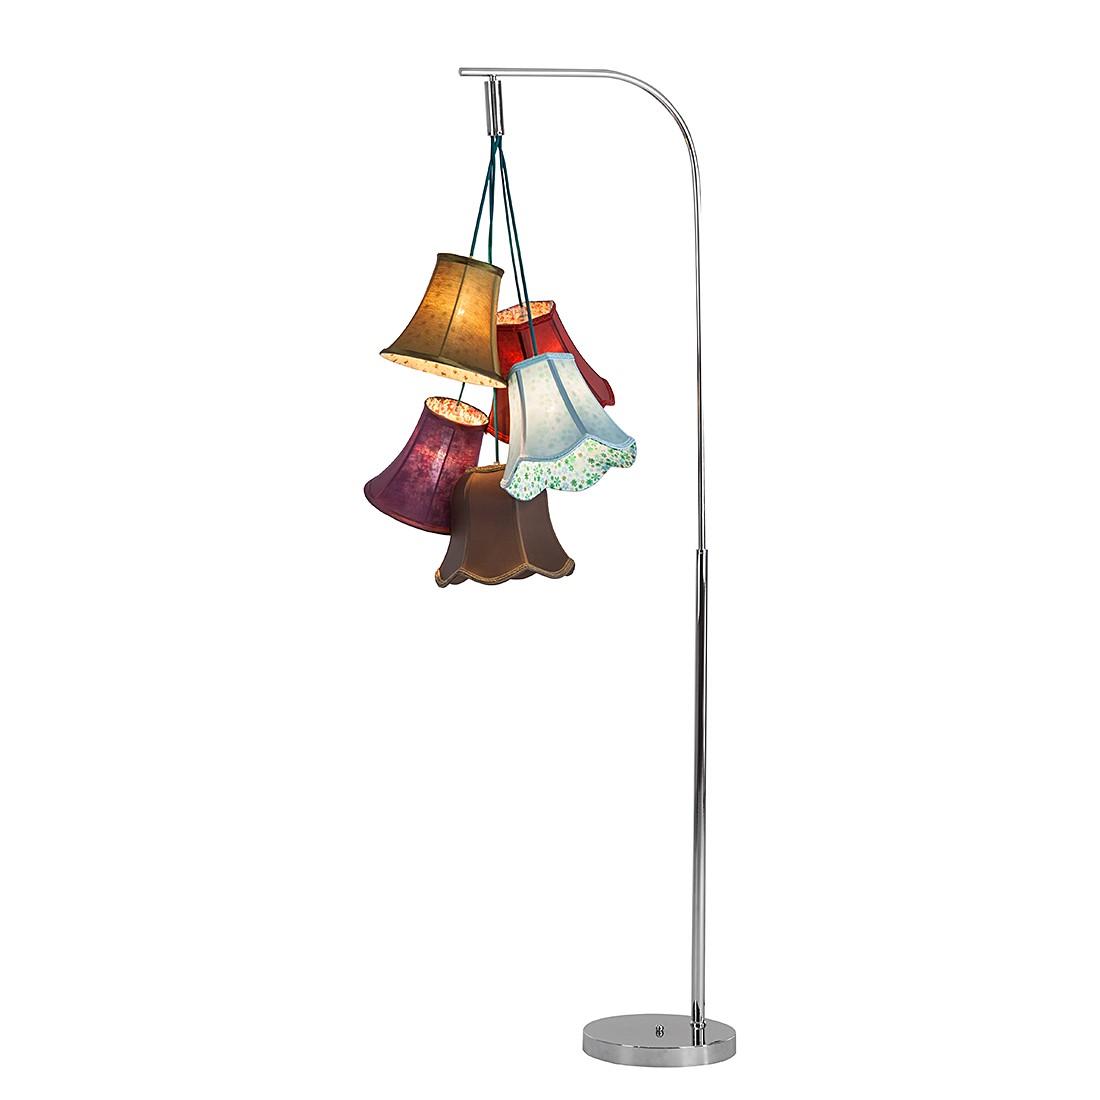 EEK A++, Lampadaire Saloon Flowers - Multicolore, Kare Design